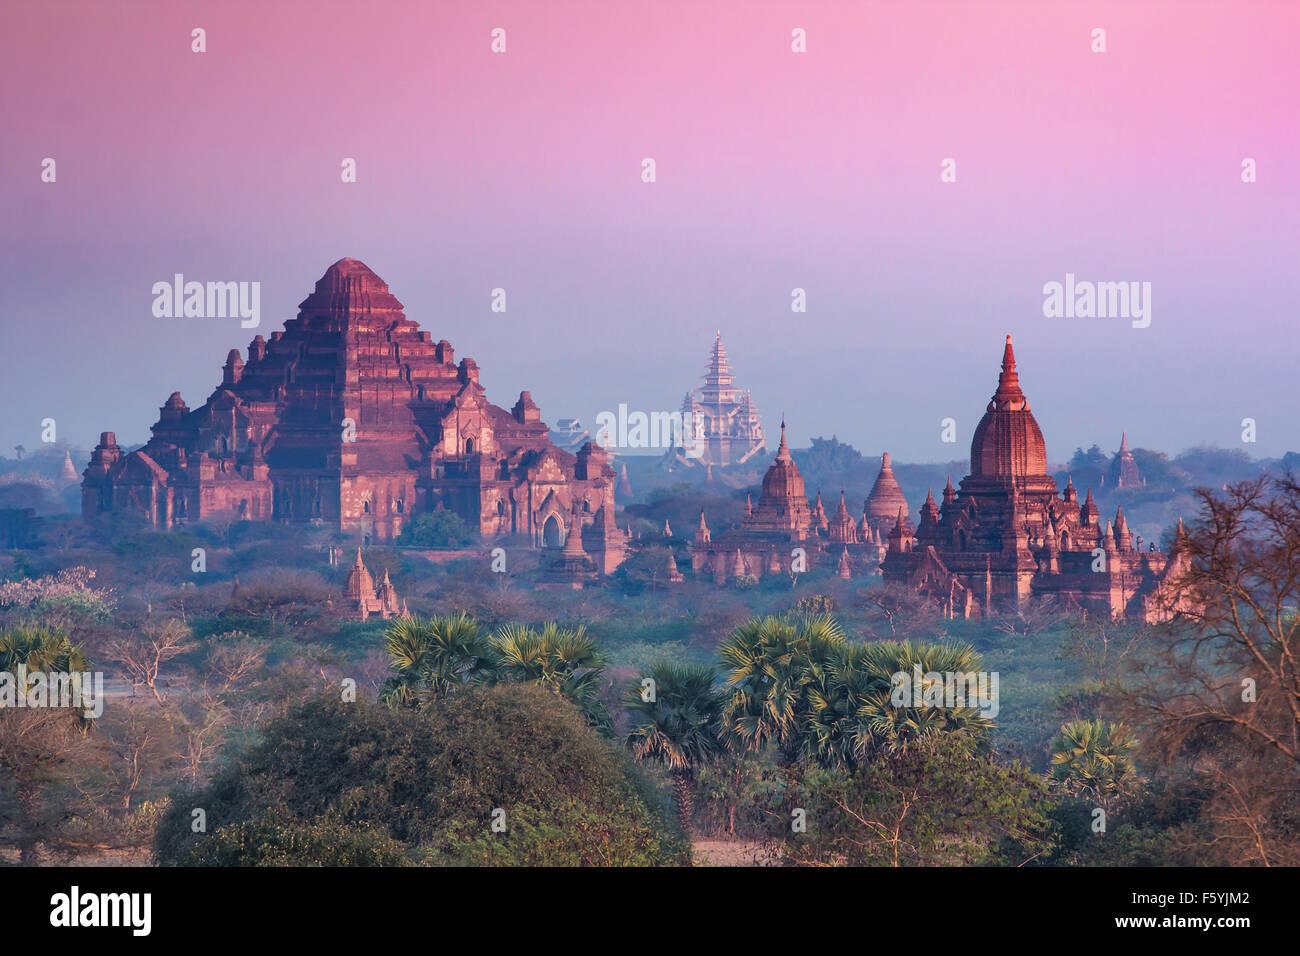 Temples in Bagan, Land of Pagoda, Myanmar Stock Photo